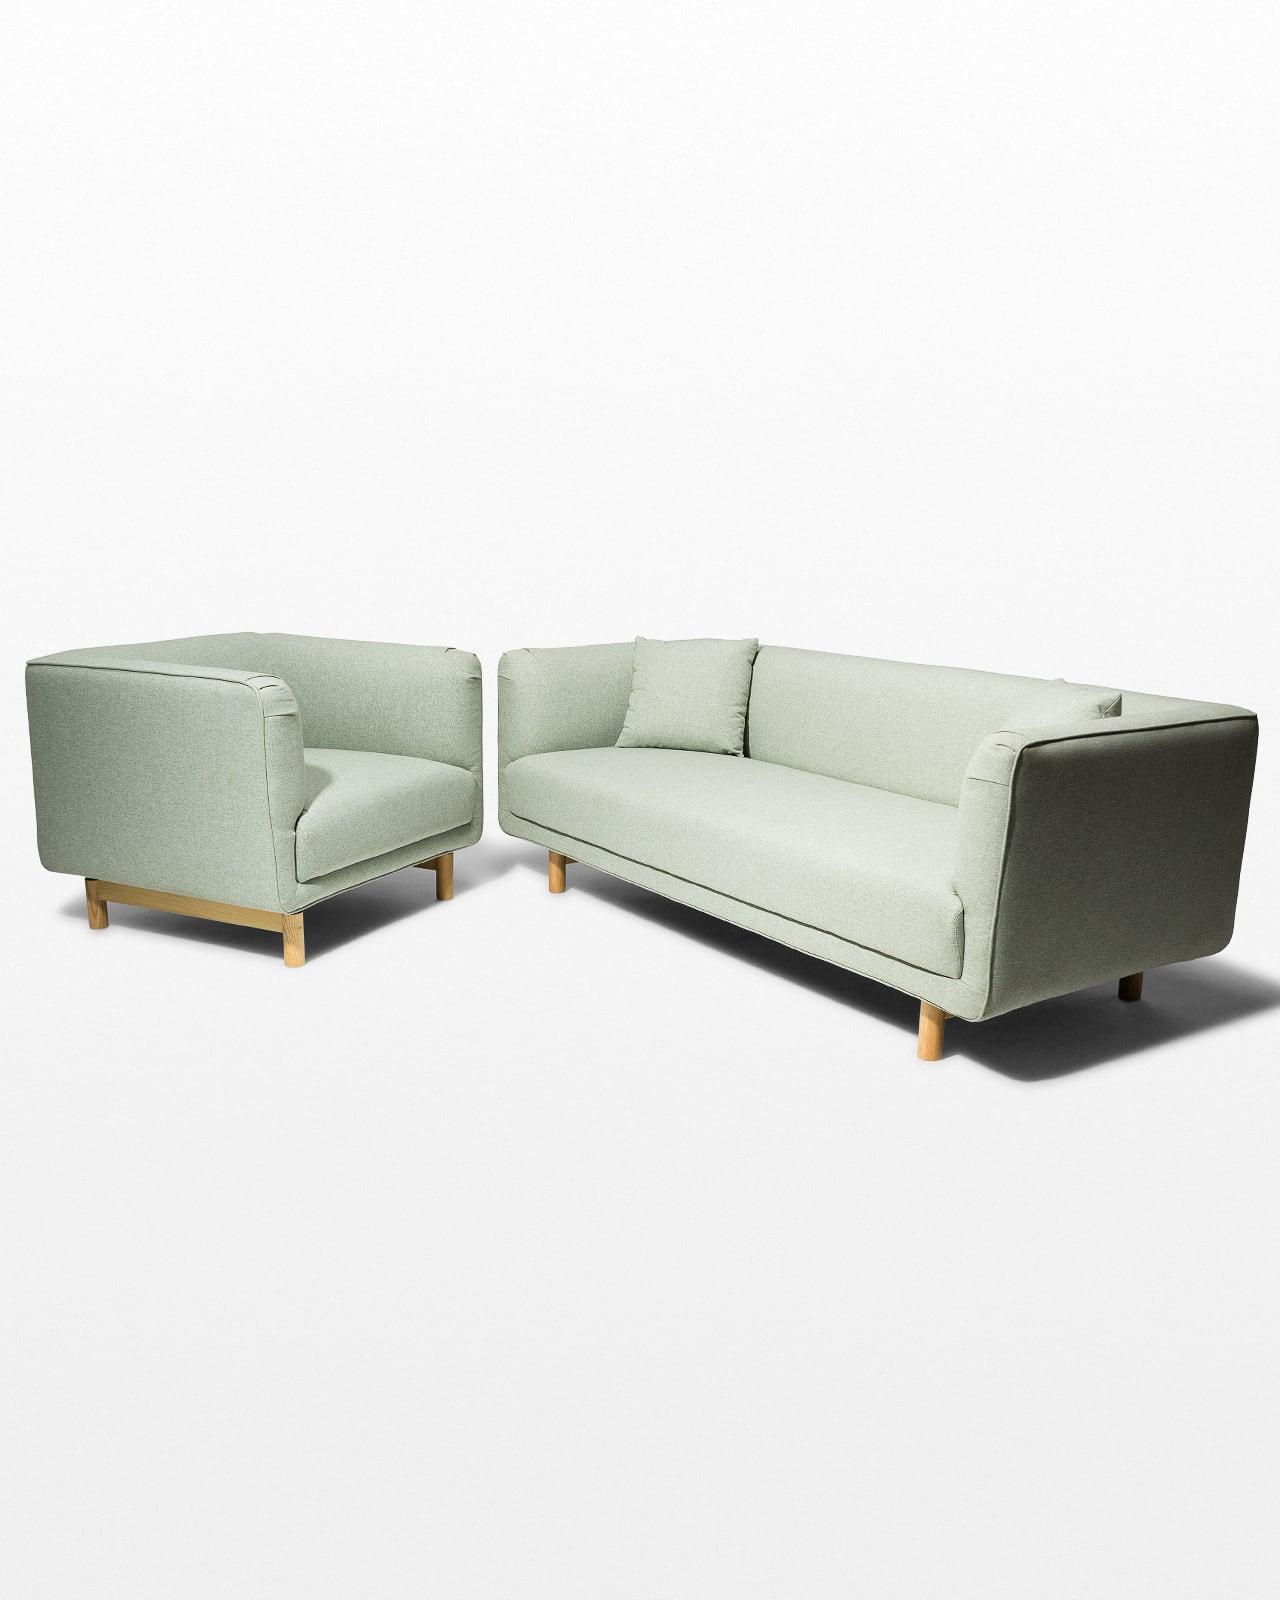 Co073 S Belmont Sofa And Armchair Set Prop Rental Acme Brooklyn